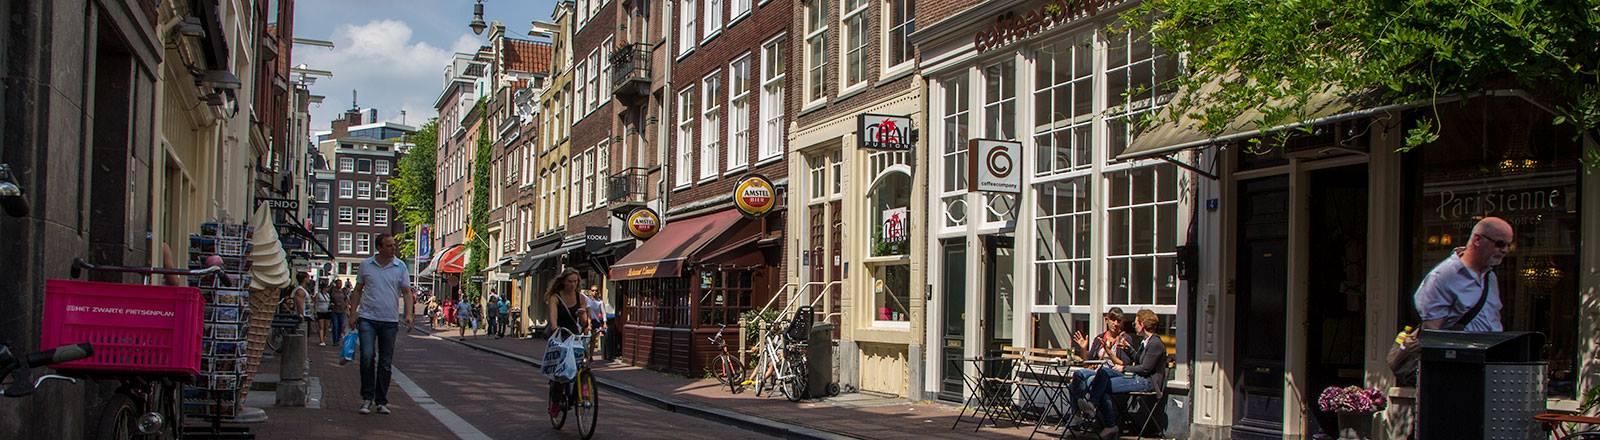 ventiblog_amsterdam_9streets